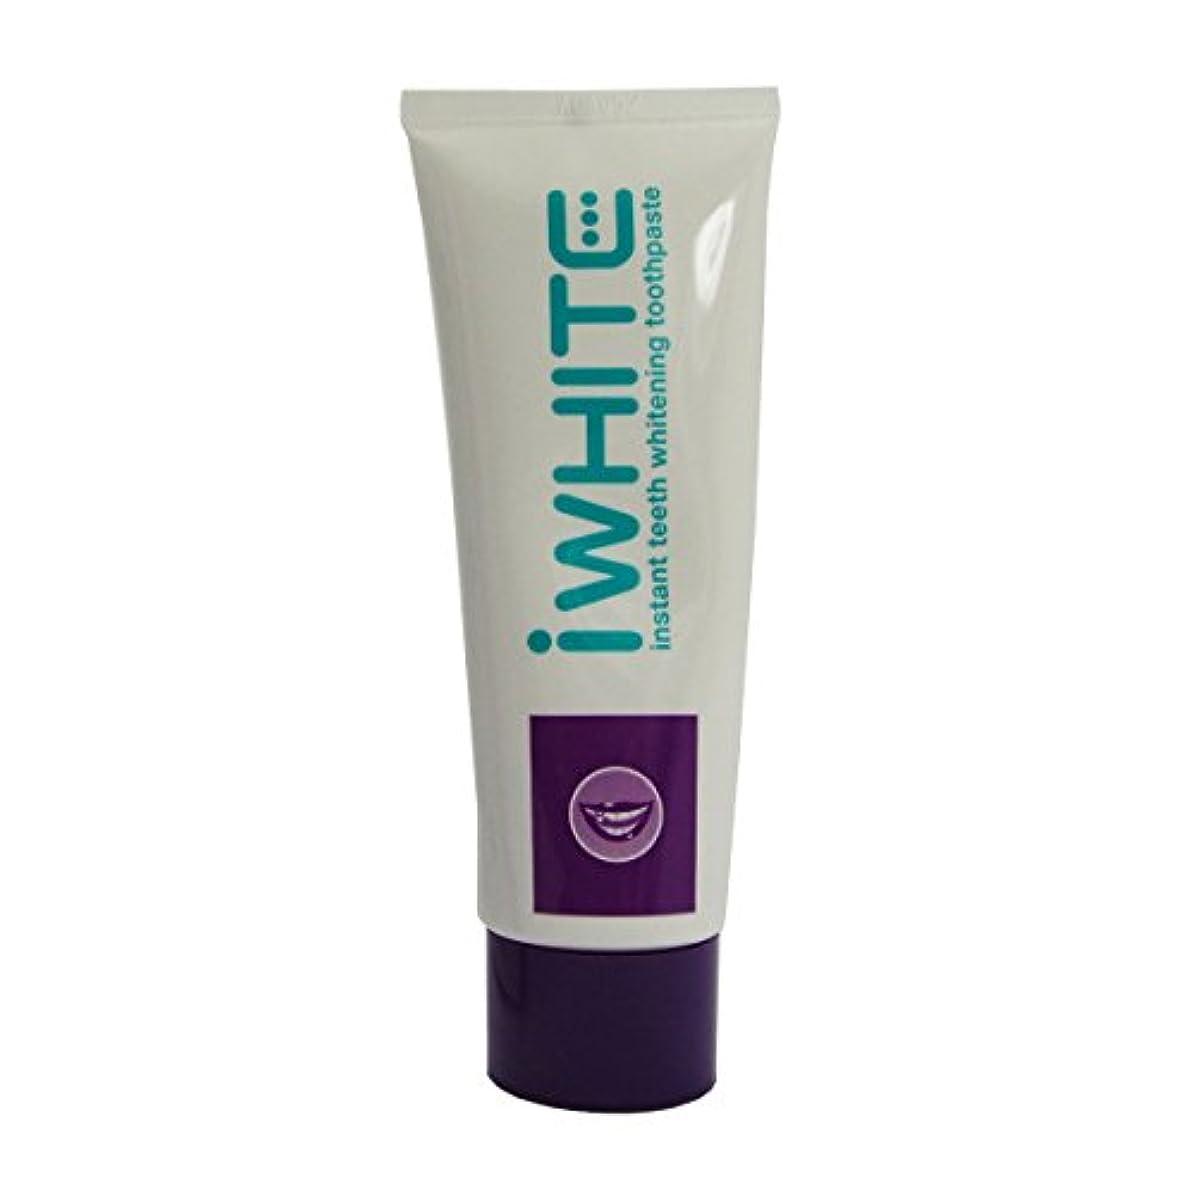 郵便番号路面電車高原Iwhite Whitening Toothpaste 75ml [並行輸入品]